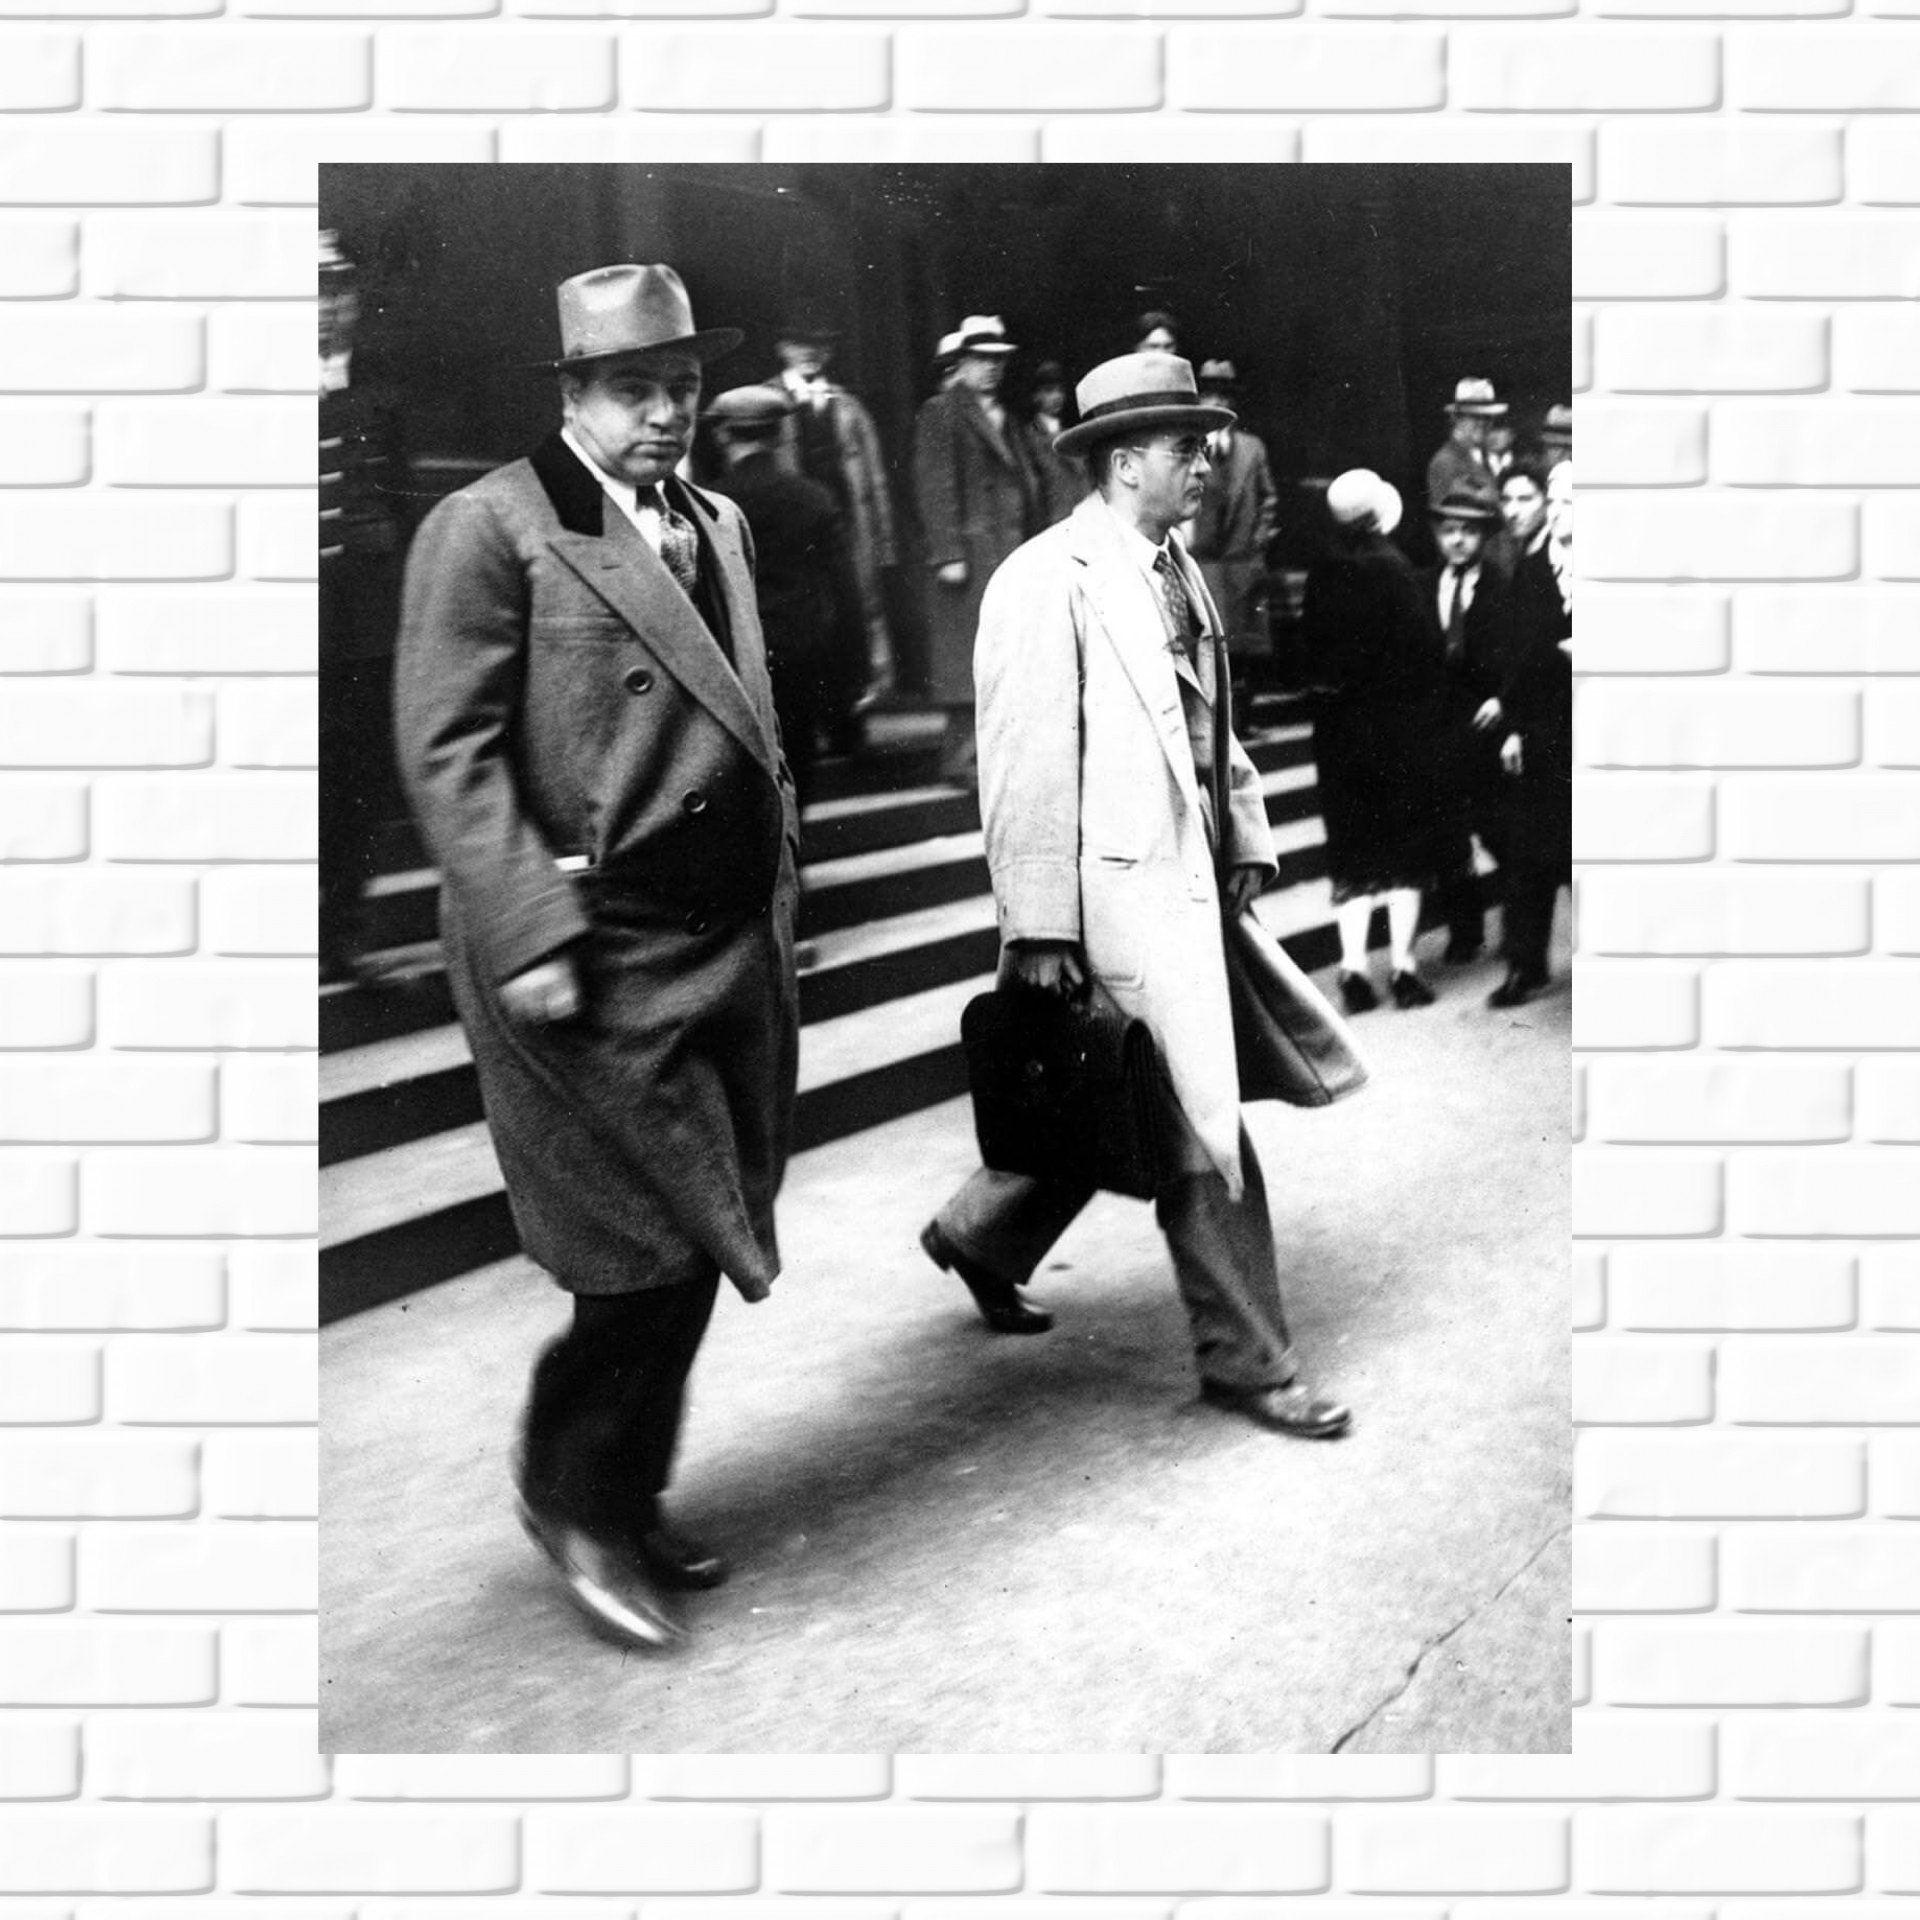 Al Capone 1931 Photo Leaving Court Tax Evasion Mafia Etsy Al Capone Man Cave Wall Art Gangster